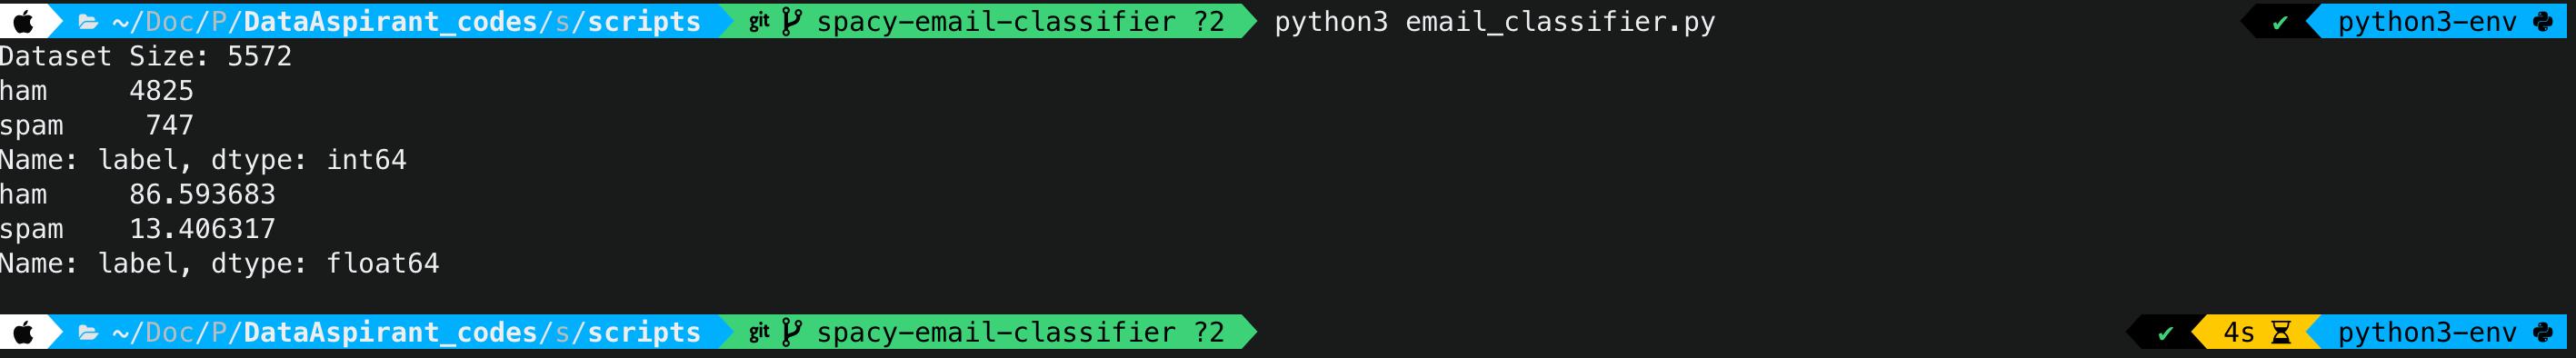 Email spam & ham dataset size